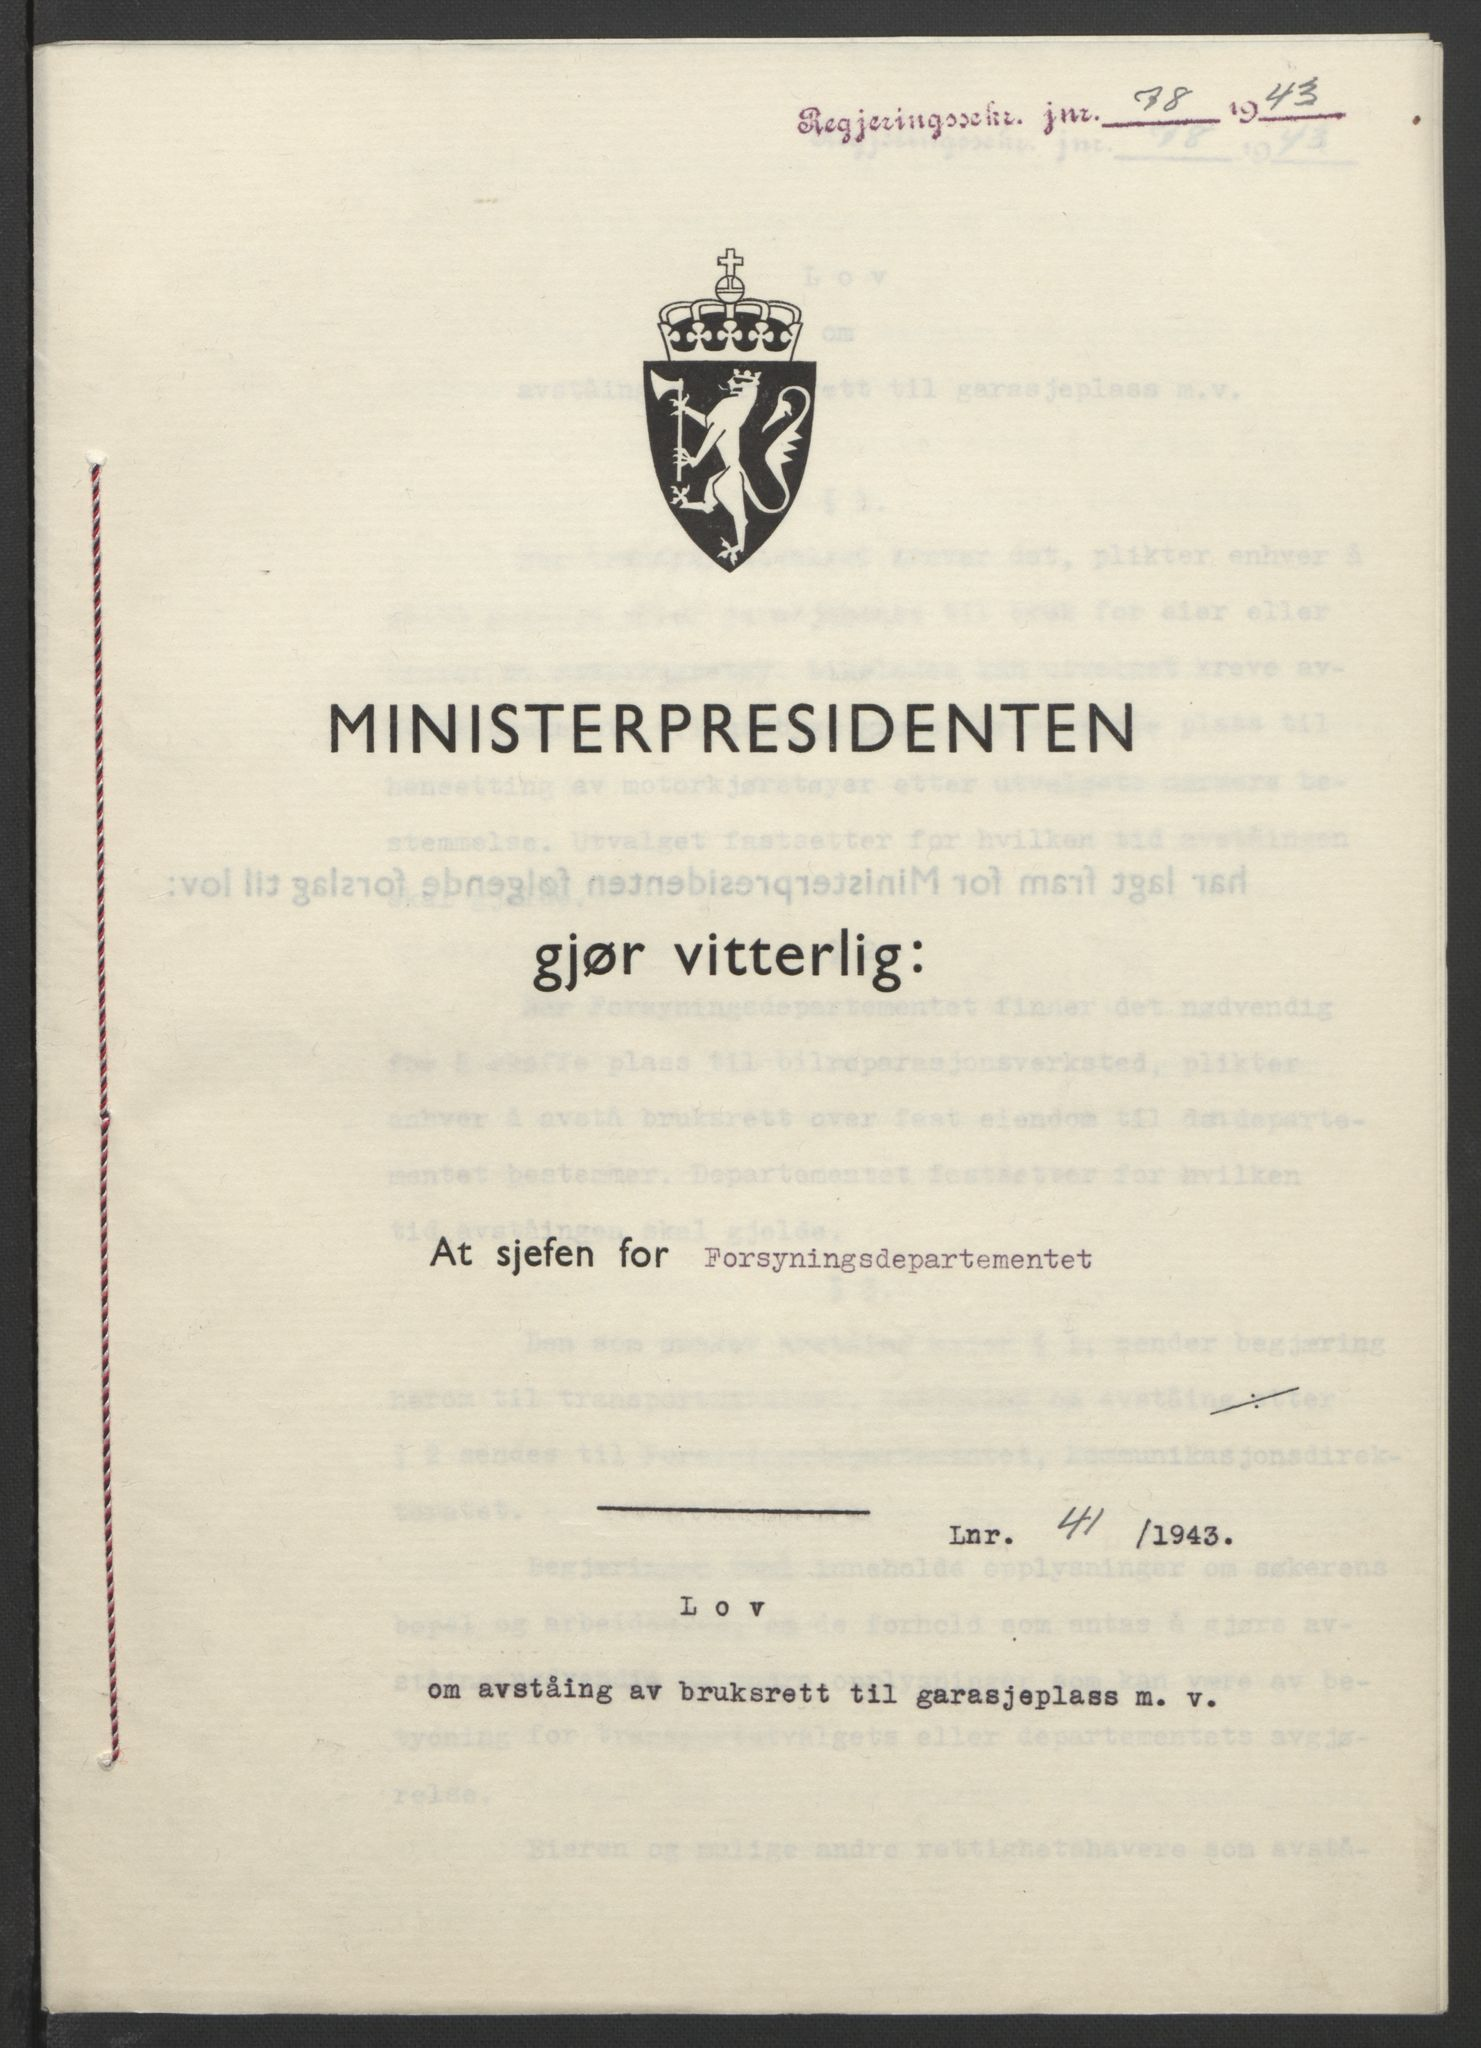 RA, NS-administrasjonen 1940-1945 (Statsrådsekretariatet, de kommisariske statsråder mm), D/Db/L0099: Lover, 1943, s. 178